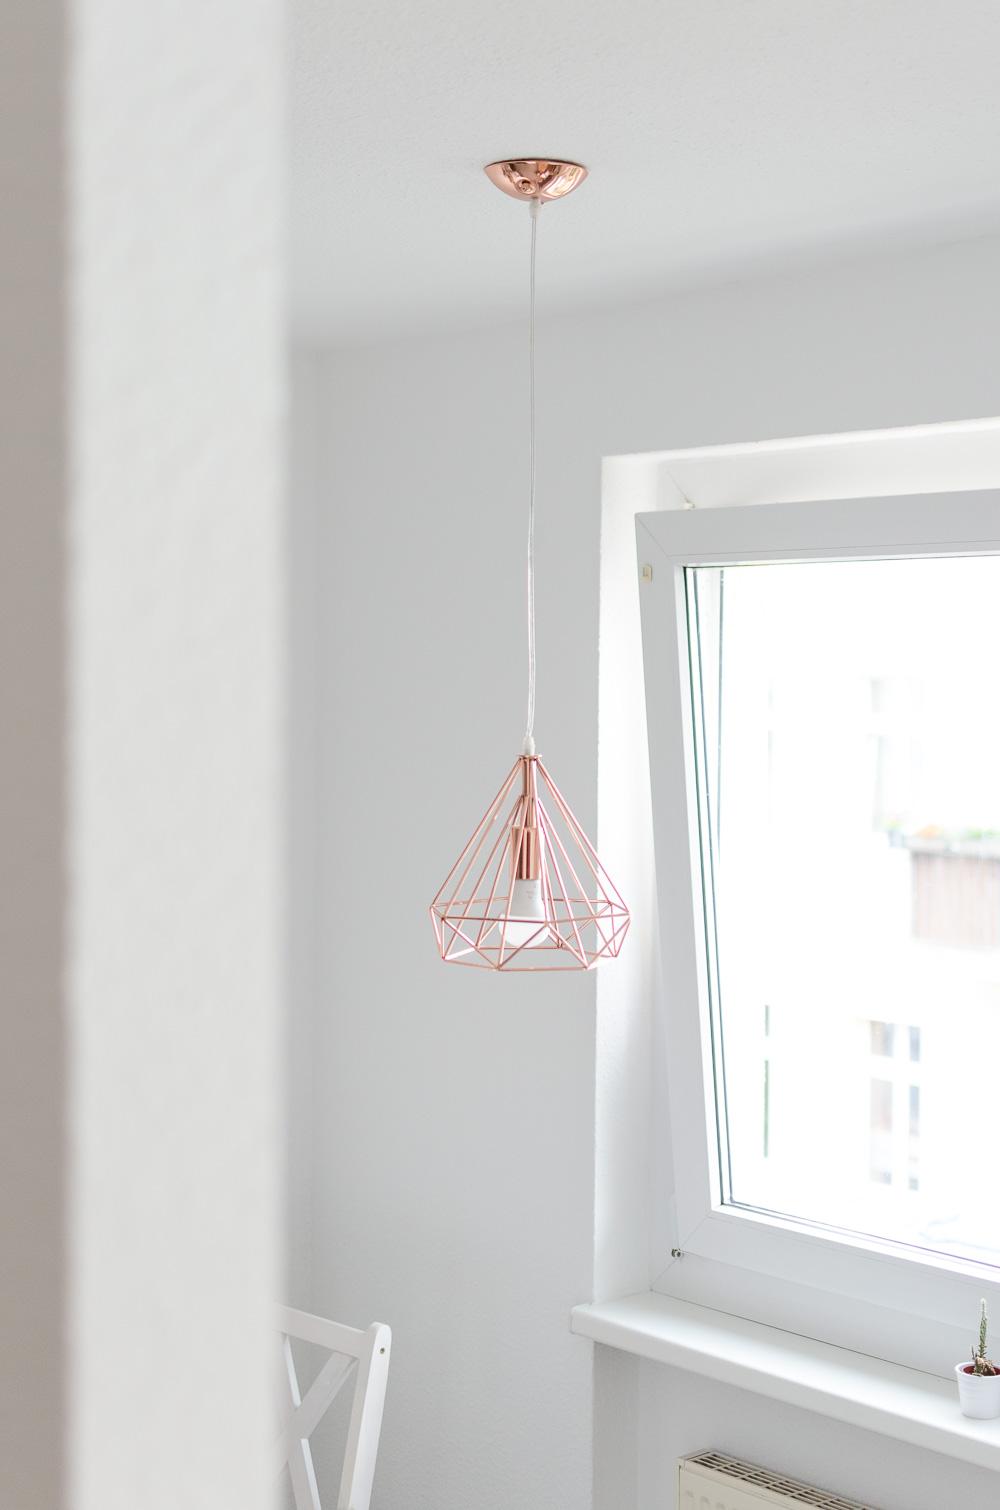 kuechen-planung-inspiration-kupfer-haengelampe